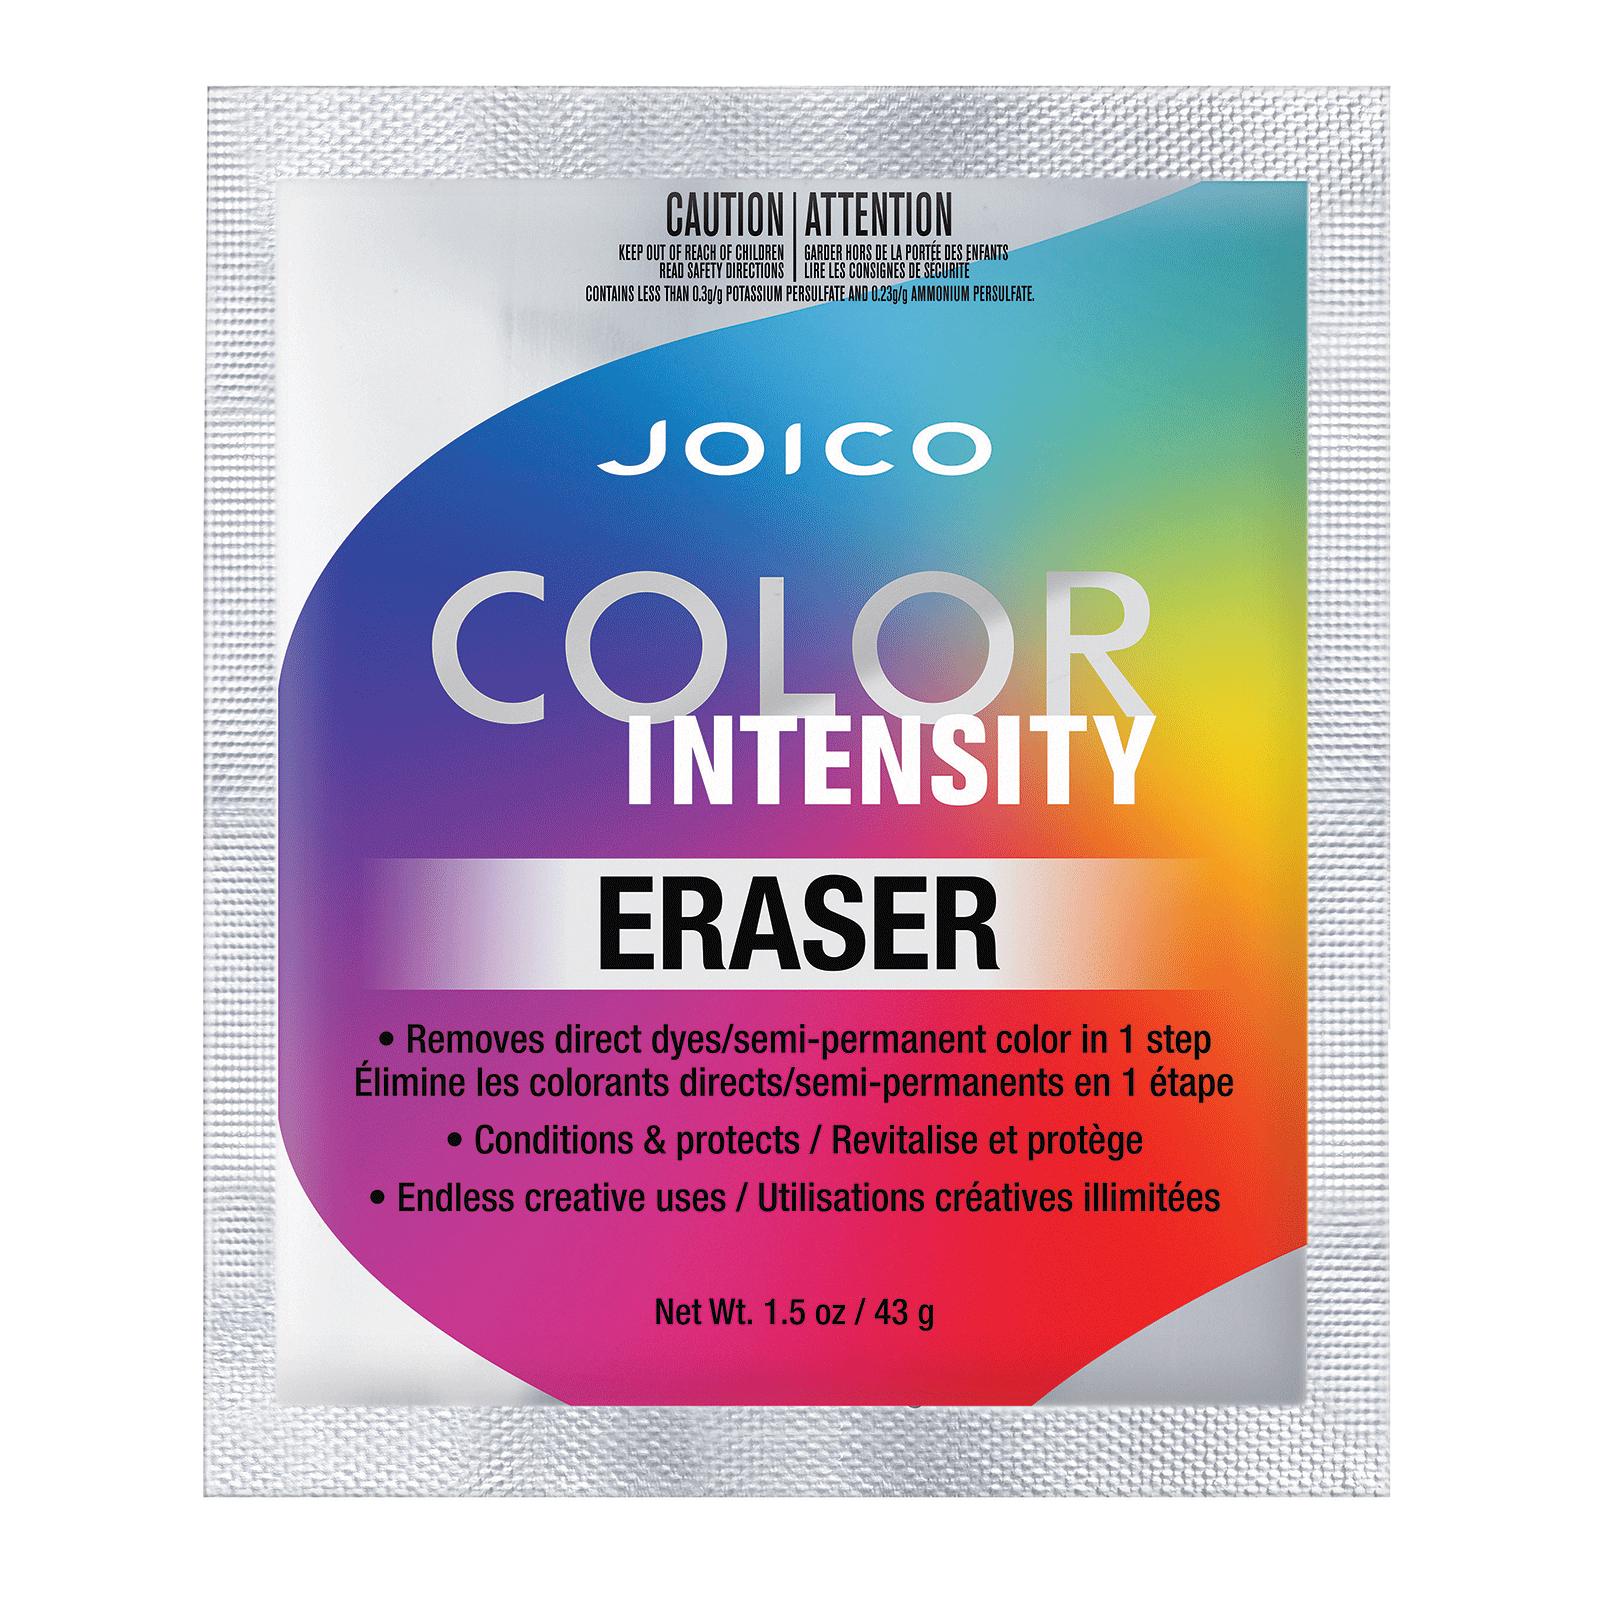 Color Intensity Eraser Joico Cosmoprof